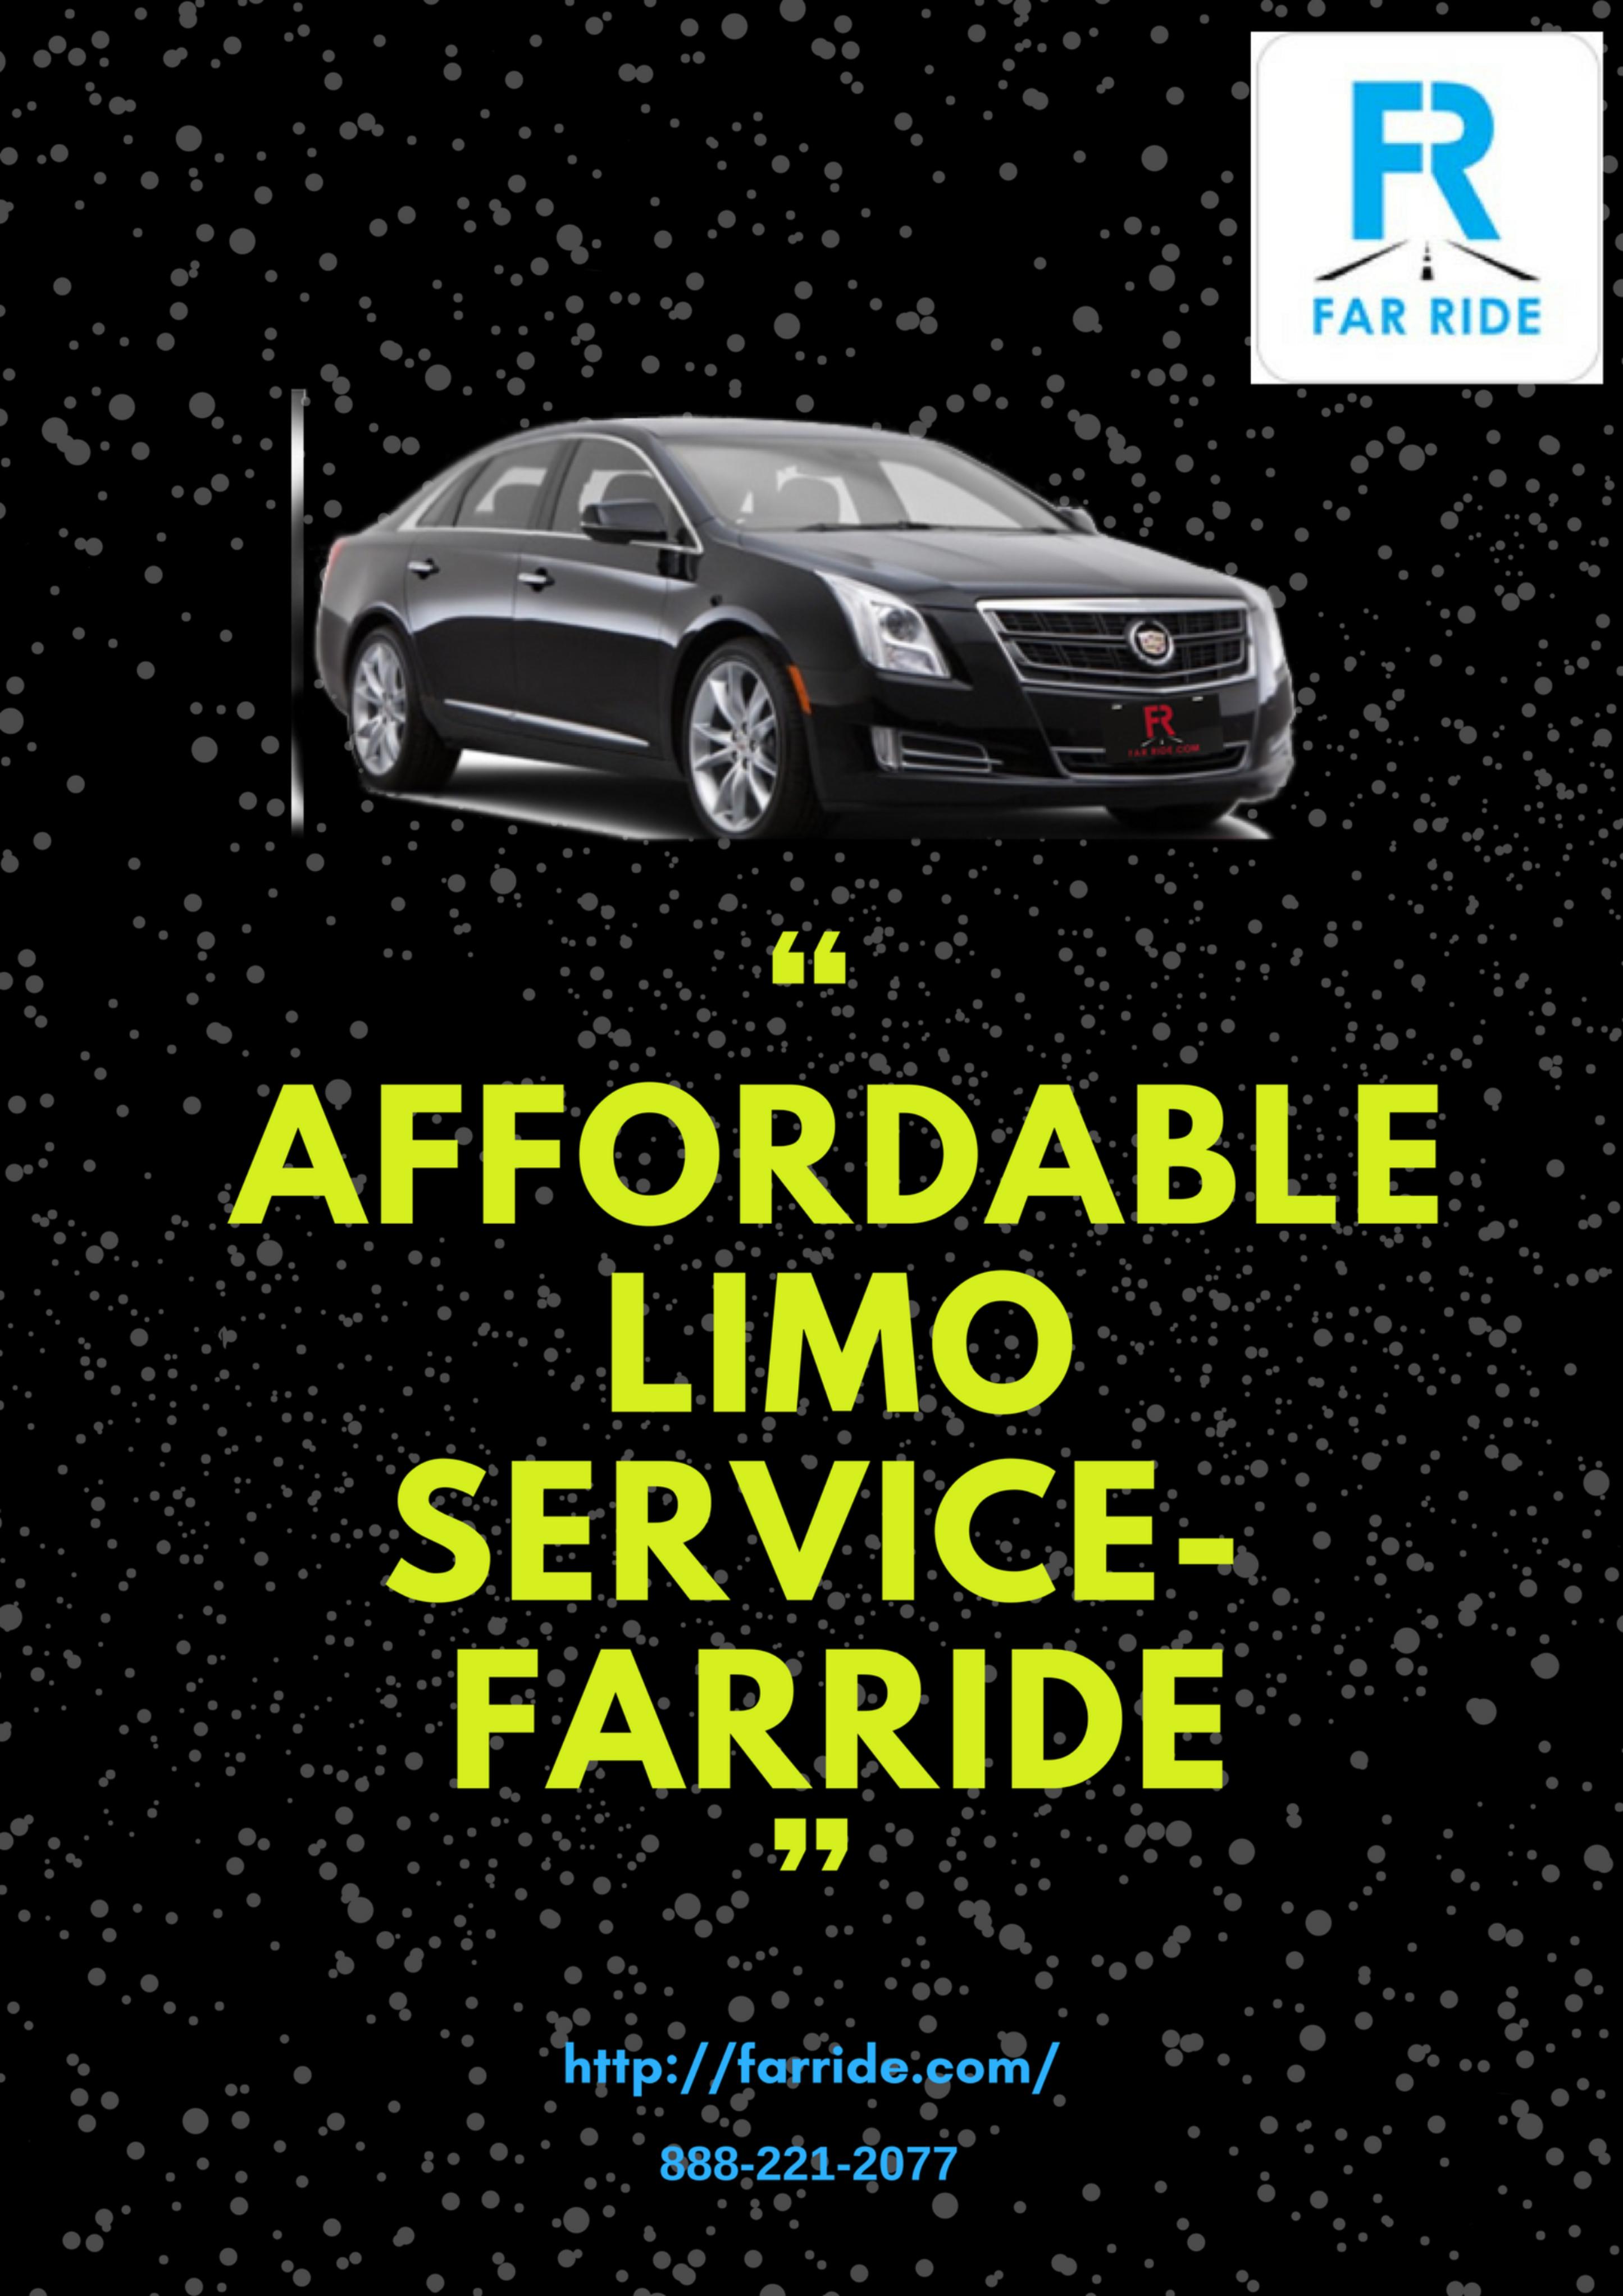 Black Car Transportation Service Transportation services